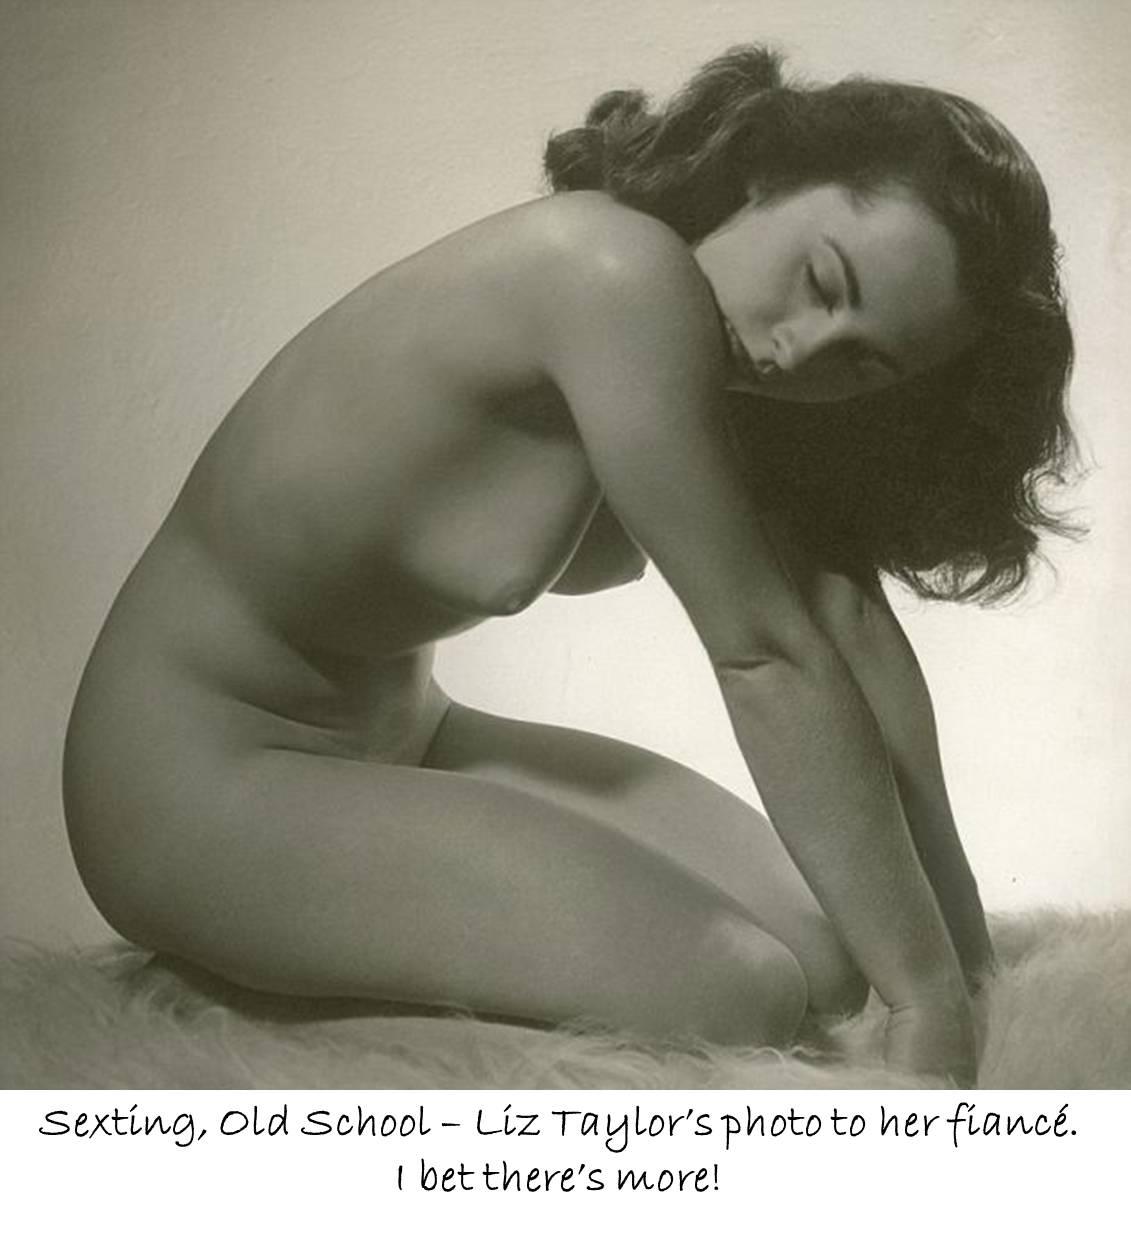 http://2.bp.blogspot.com/-lVeAzGgotJY/TZhr1_TMRBI/AAAAAAAAAj8/anoMB9TaHRQ/s1600/Nude%2BLiz%2BTaylor%2BPhoto.jpg